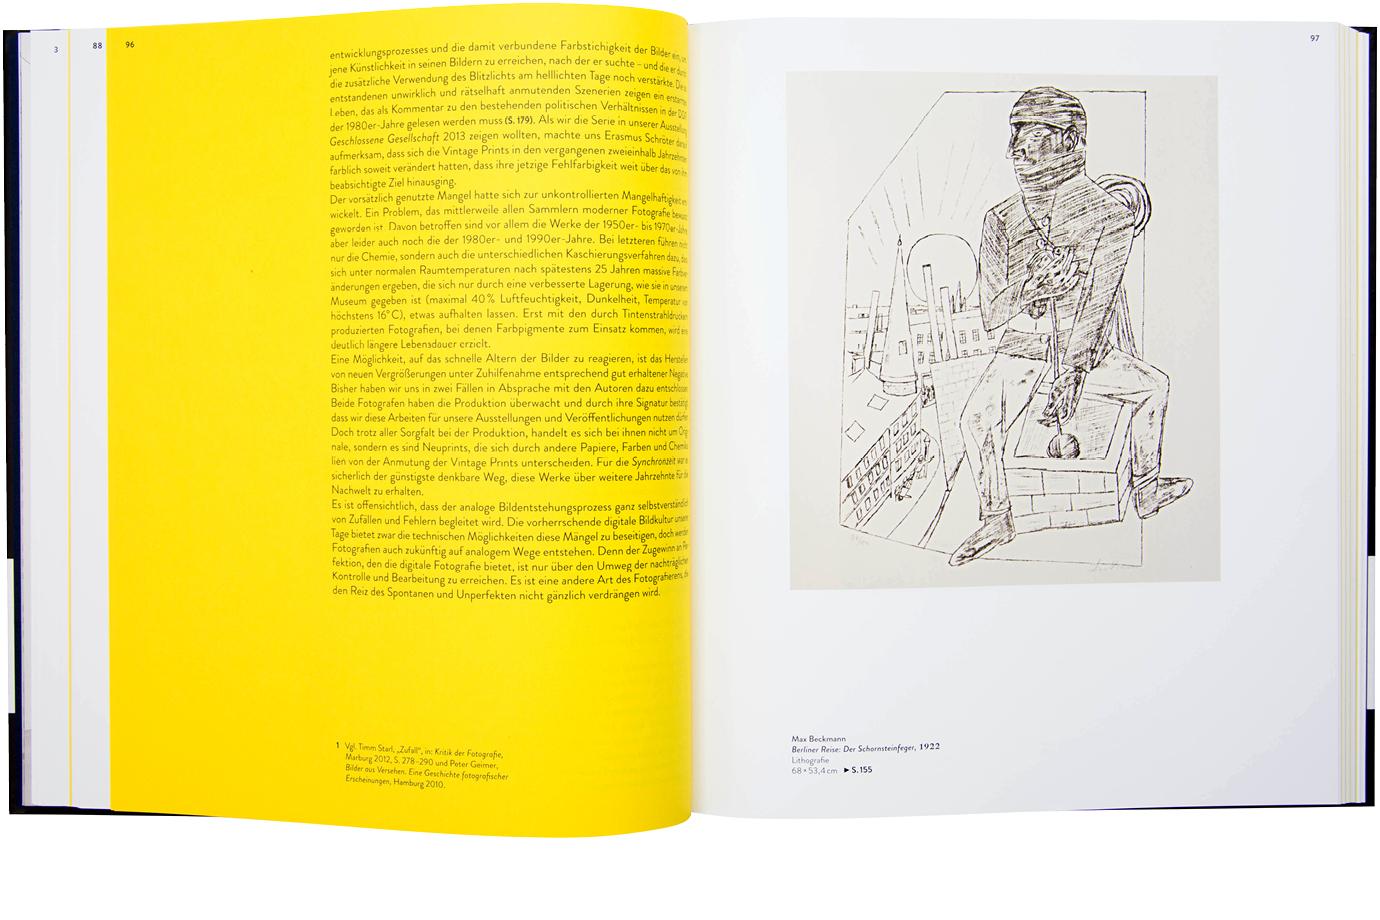 http://e-o-t.de/wordpress/wp-content/uploads/2017/06/2015_eot-BG-Jubilaeum-Book-12.jpg